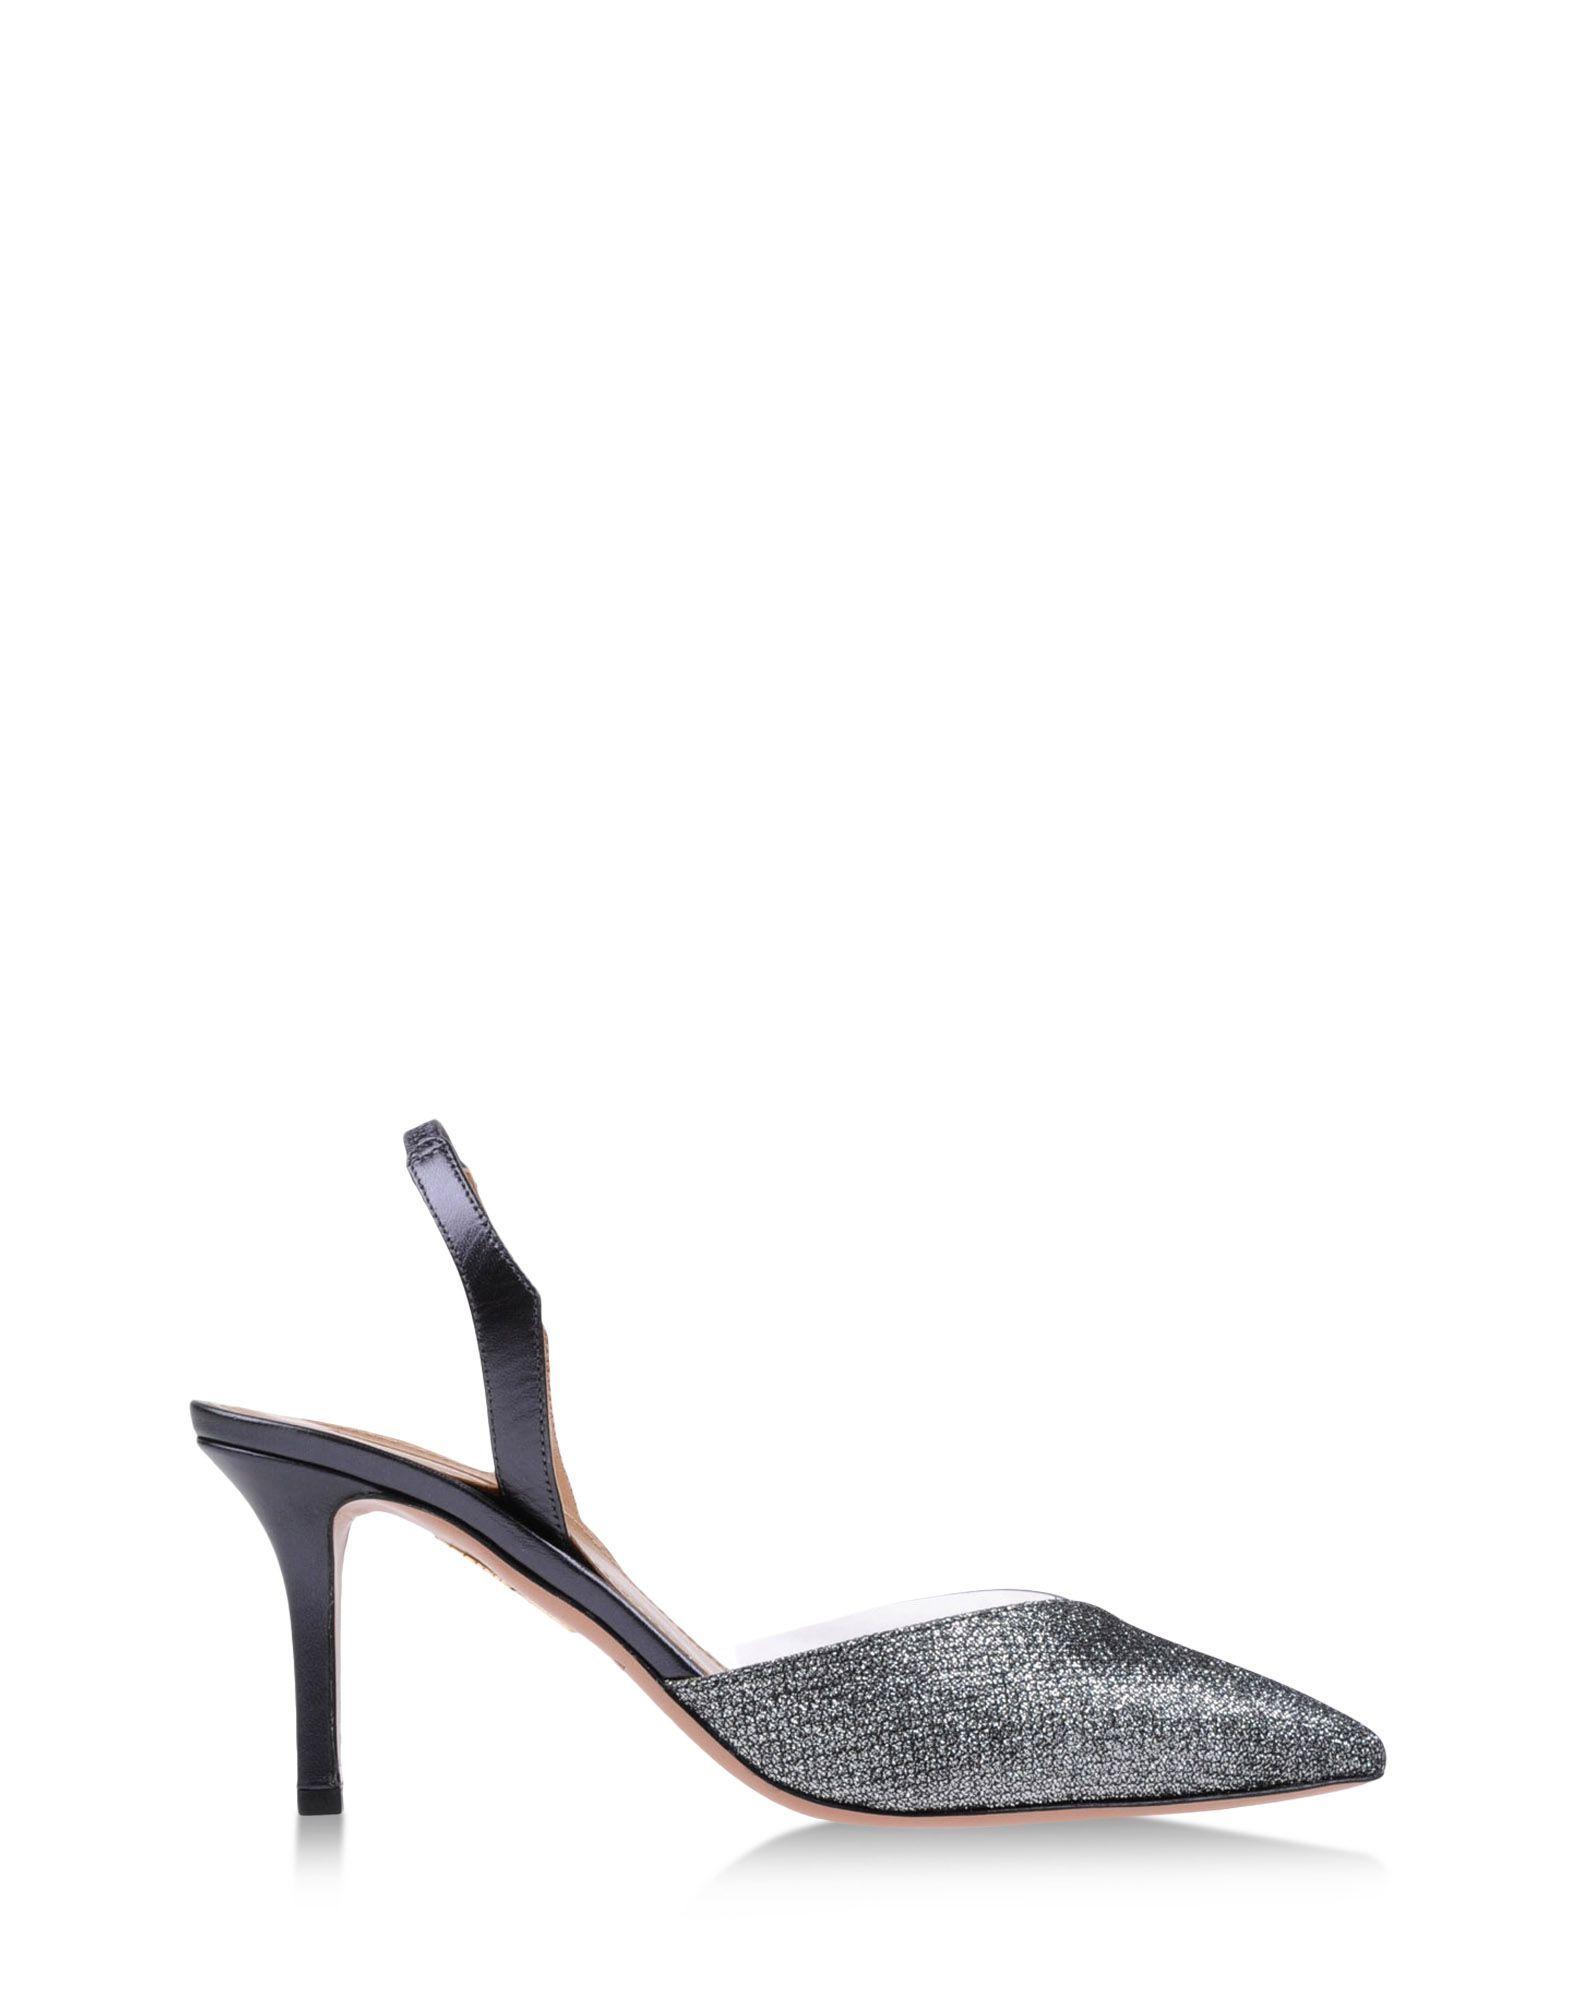 Metallic Shoes at #ShopBAZAAR - Aquazzura Silver  Slingback Kitten Heels